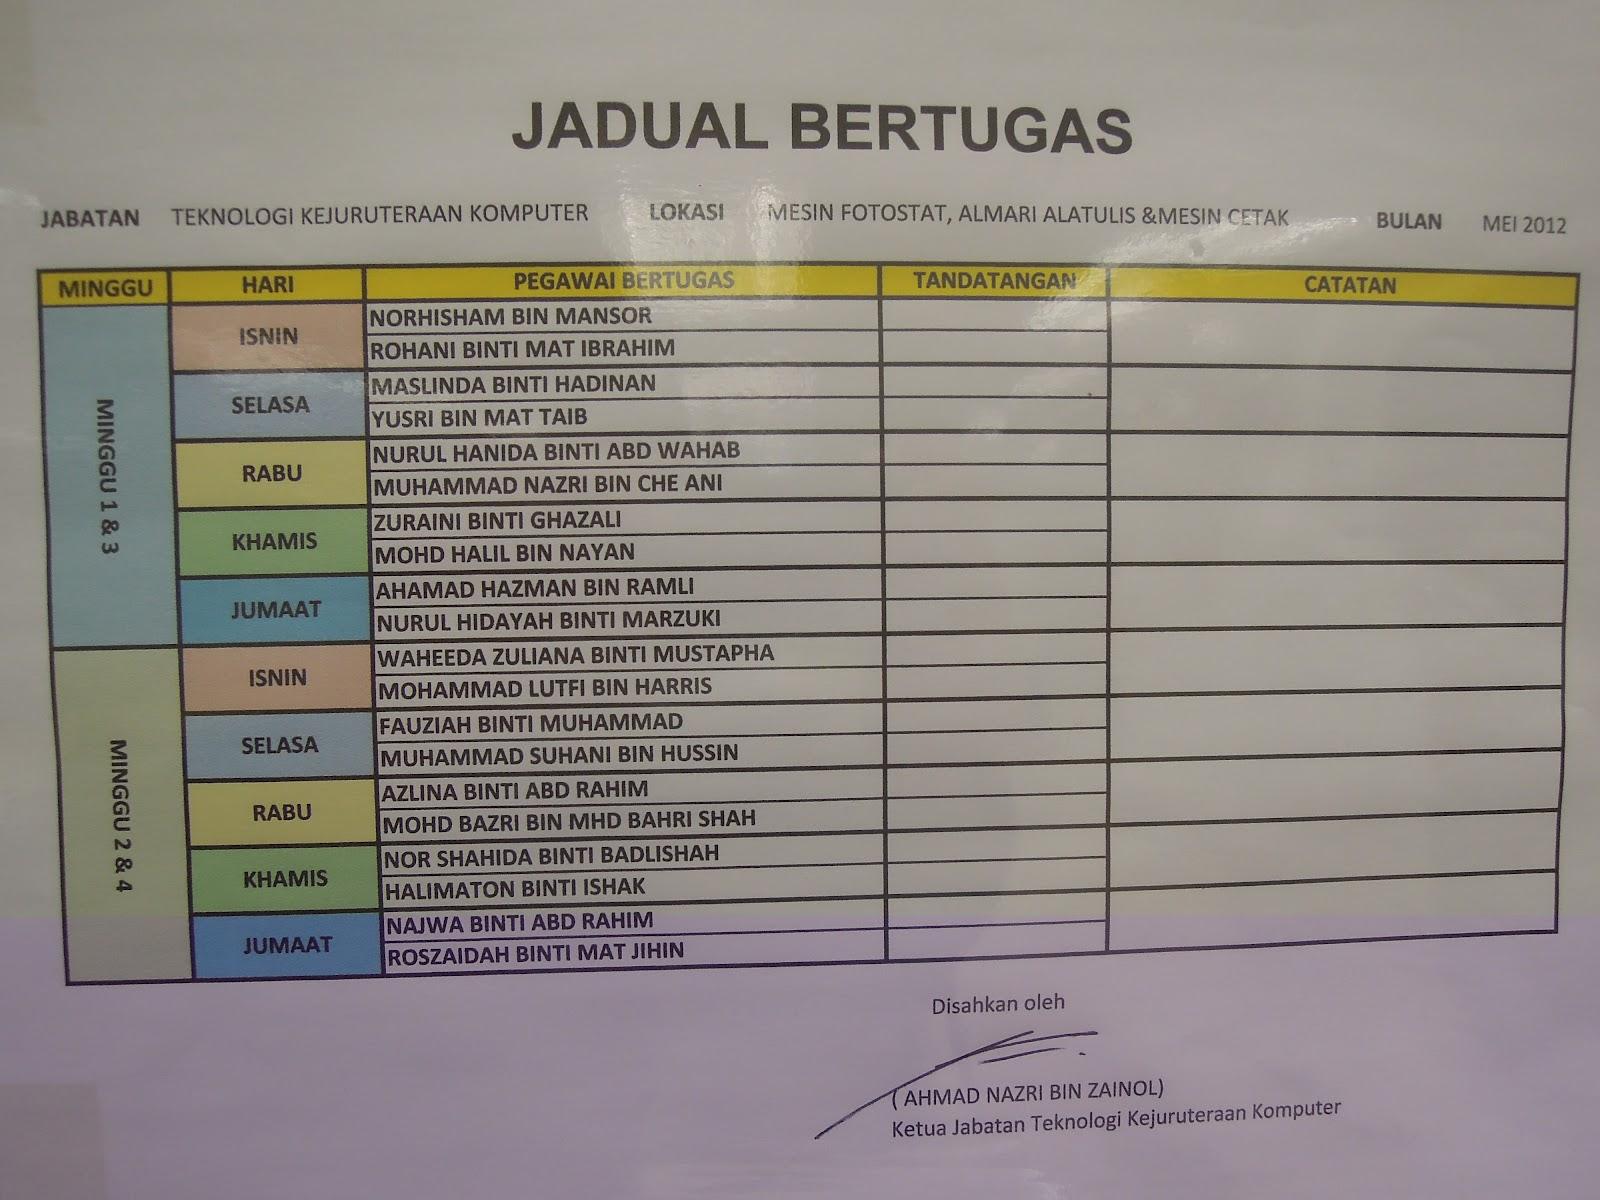 Contoh Judul Penelitian Perikanan Kumpulan Contoh Judul Skripsi Bahasa Indonesia Kumpulan Judul Contoh Skripsi Hukum Internasional Contoh Review